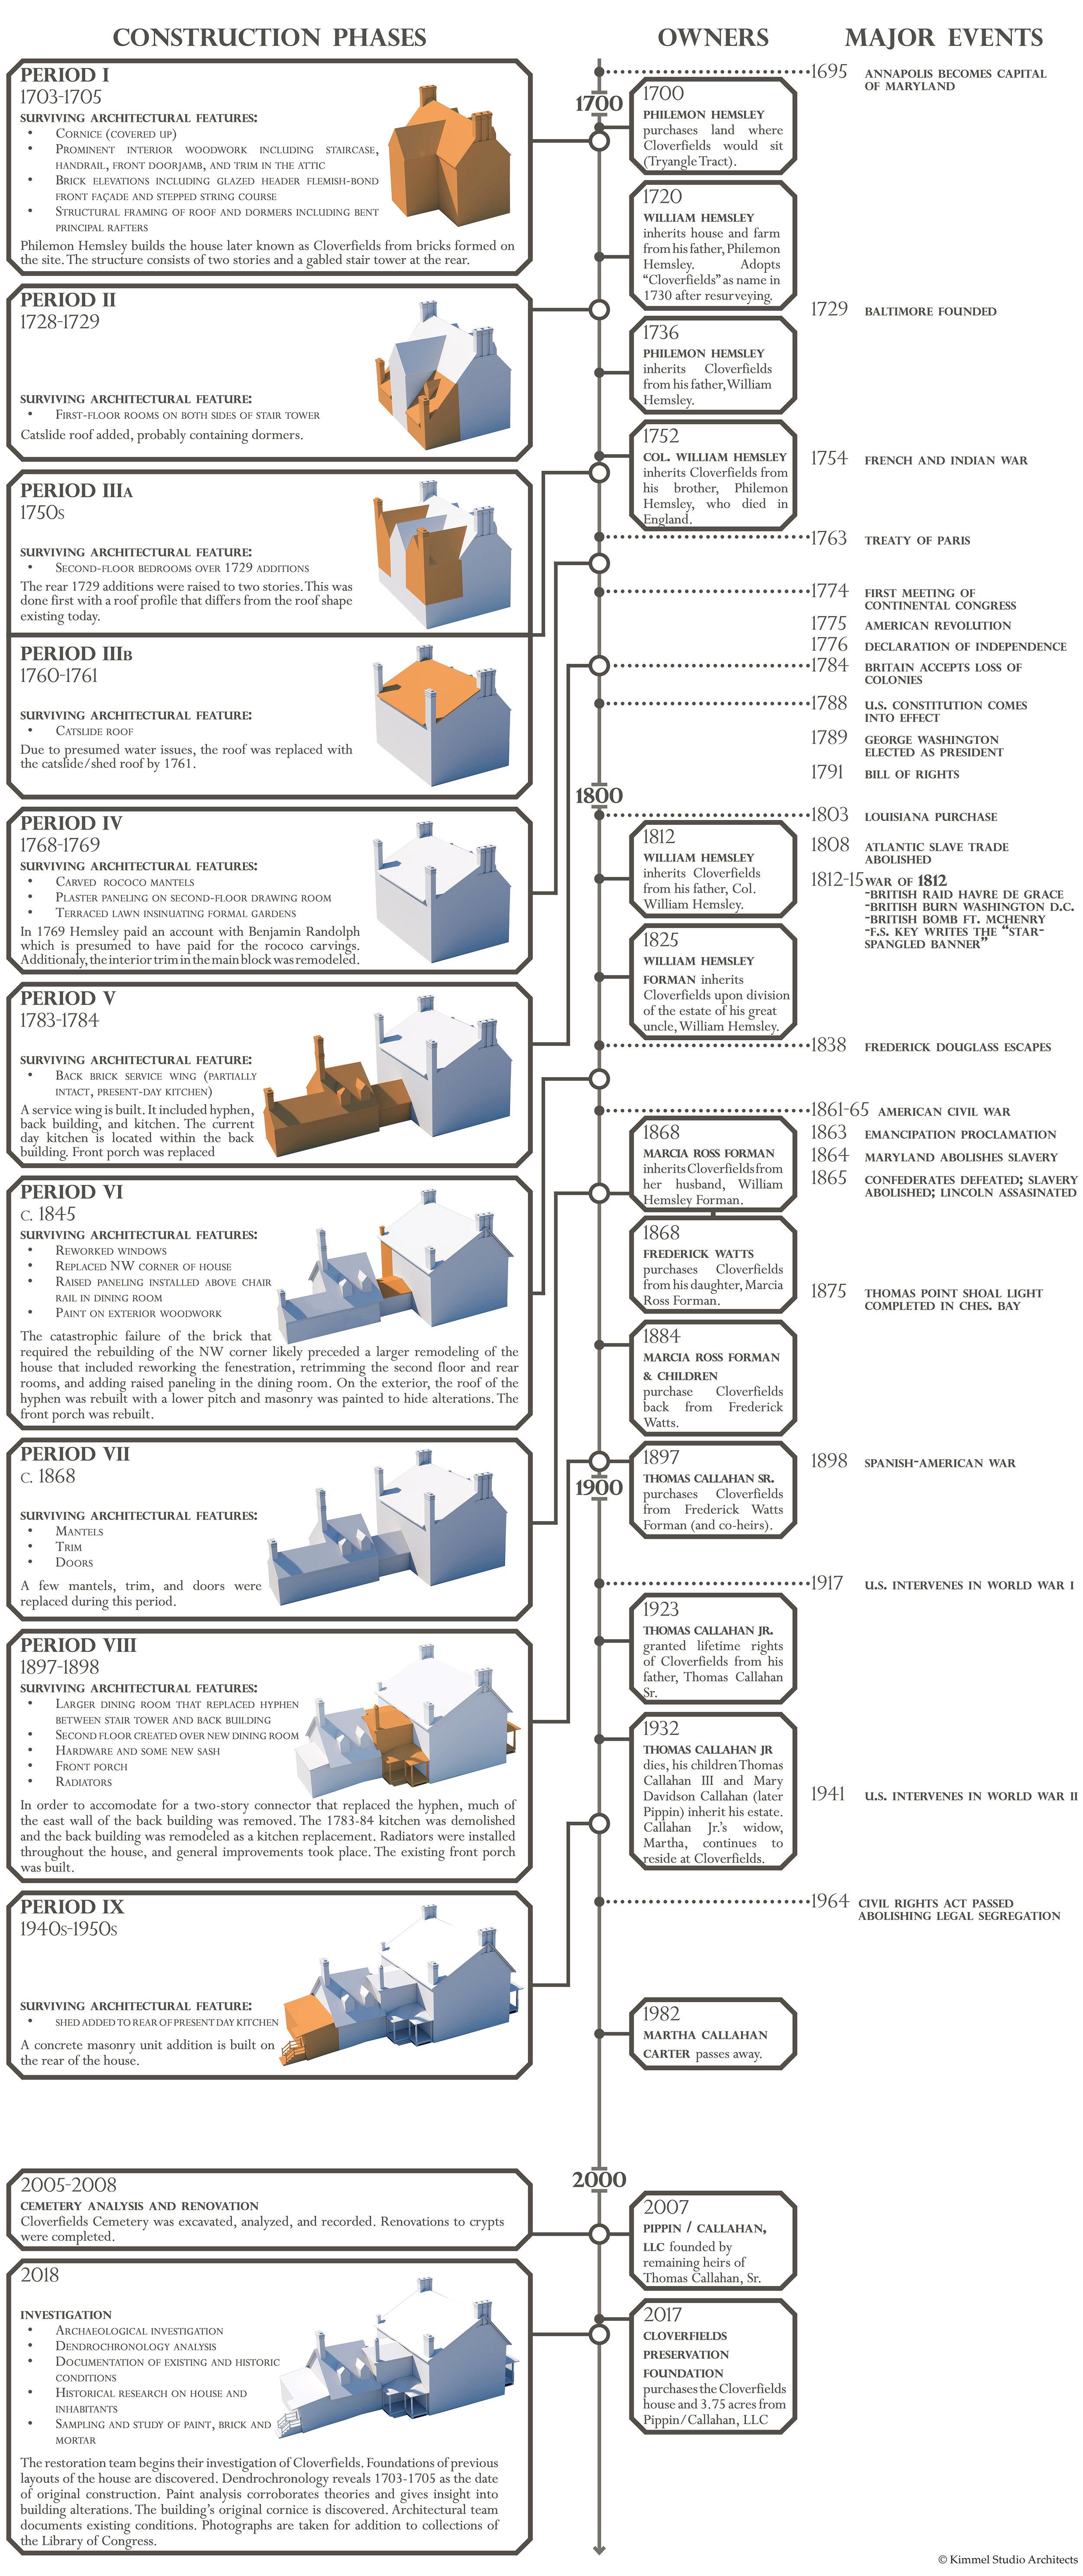 Kimmel Studio - Cloverfields Timeline for Web.jpg